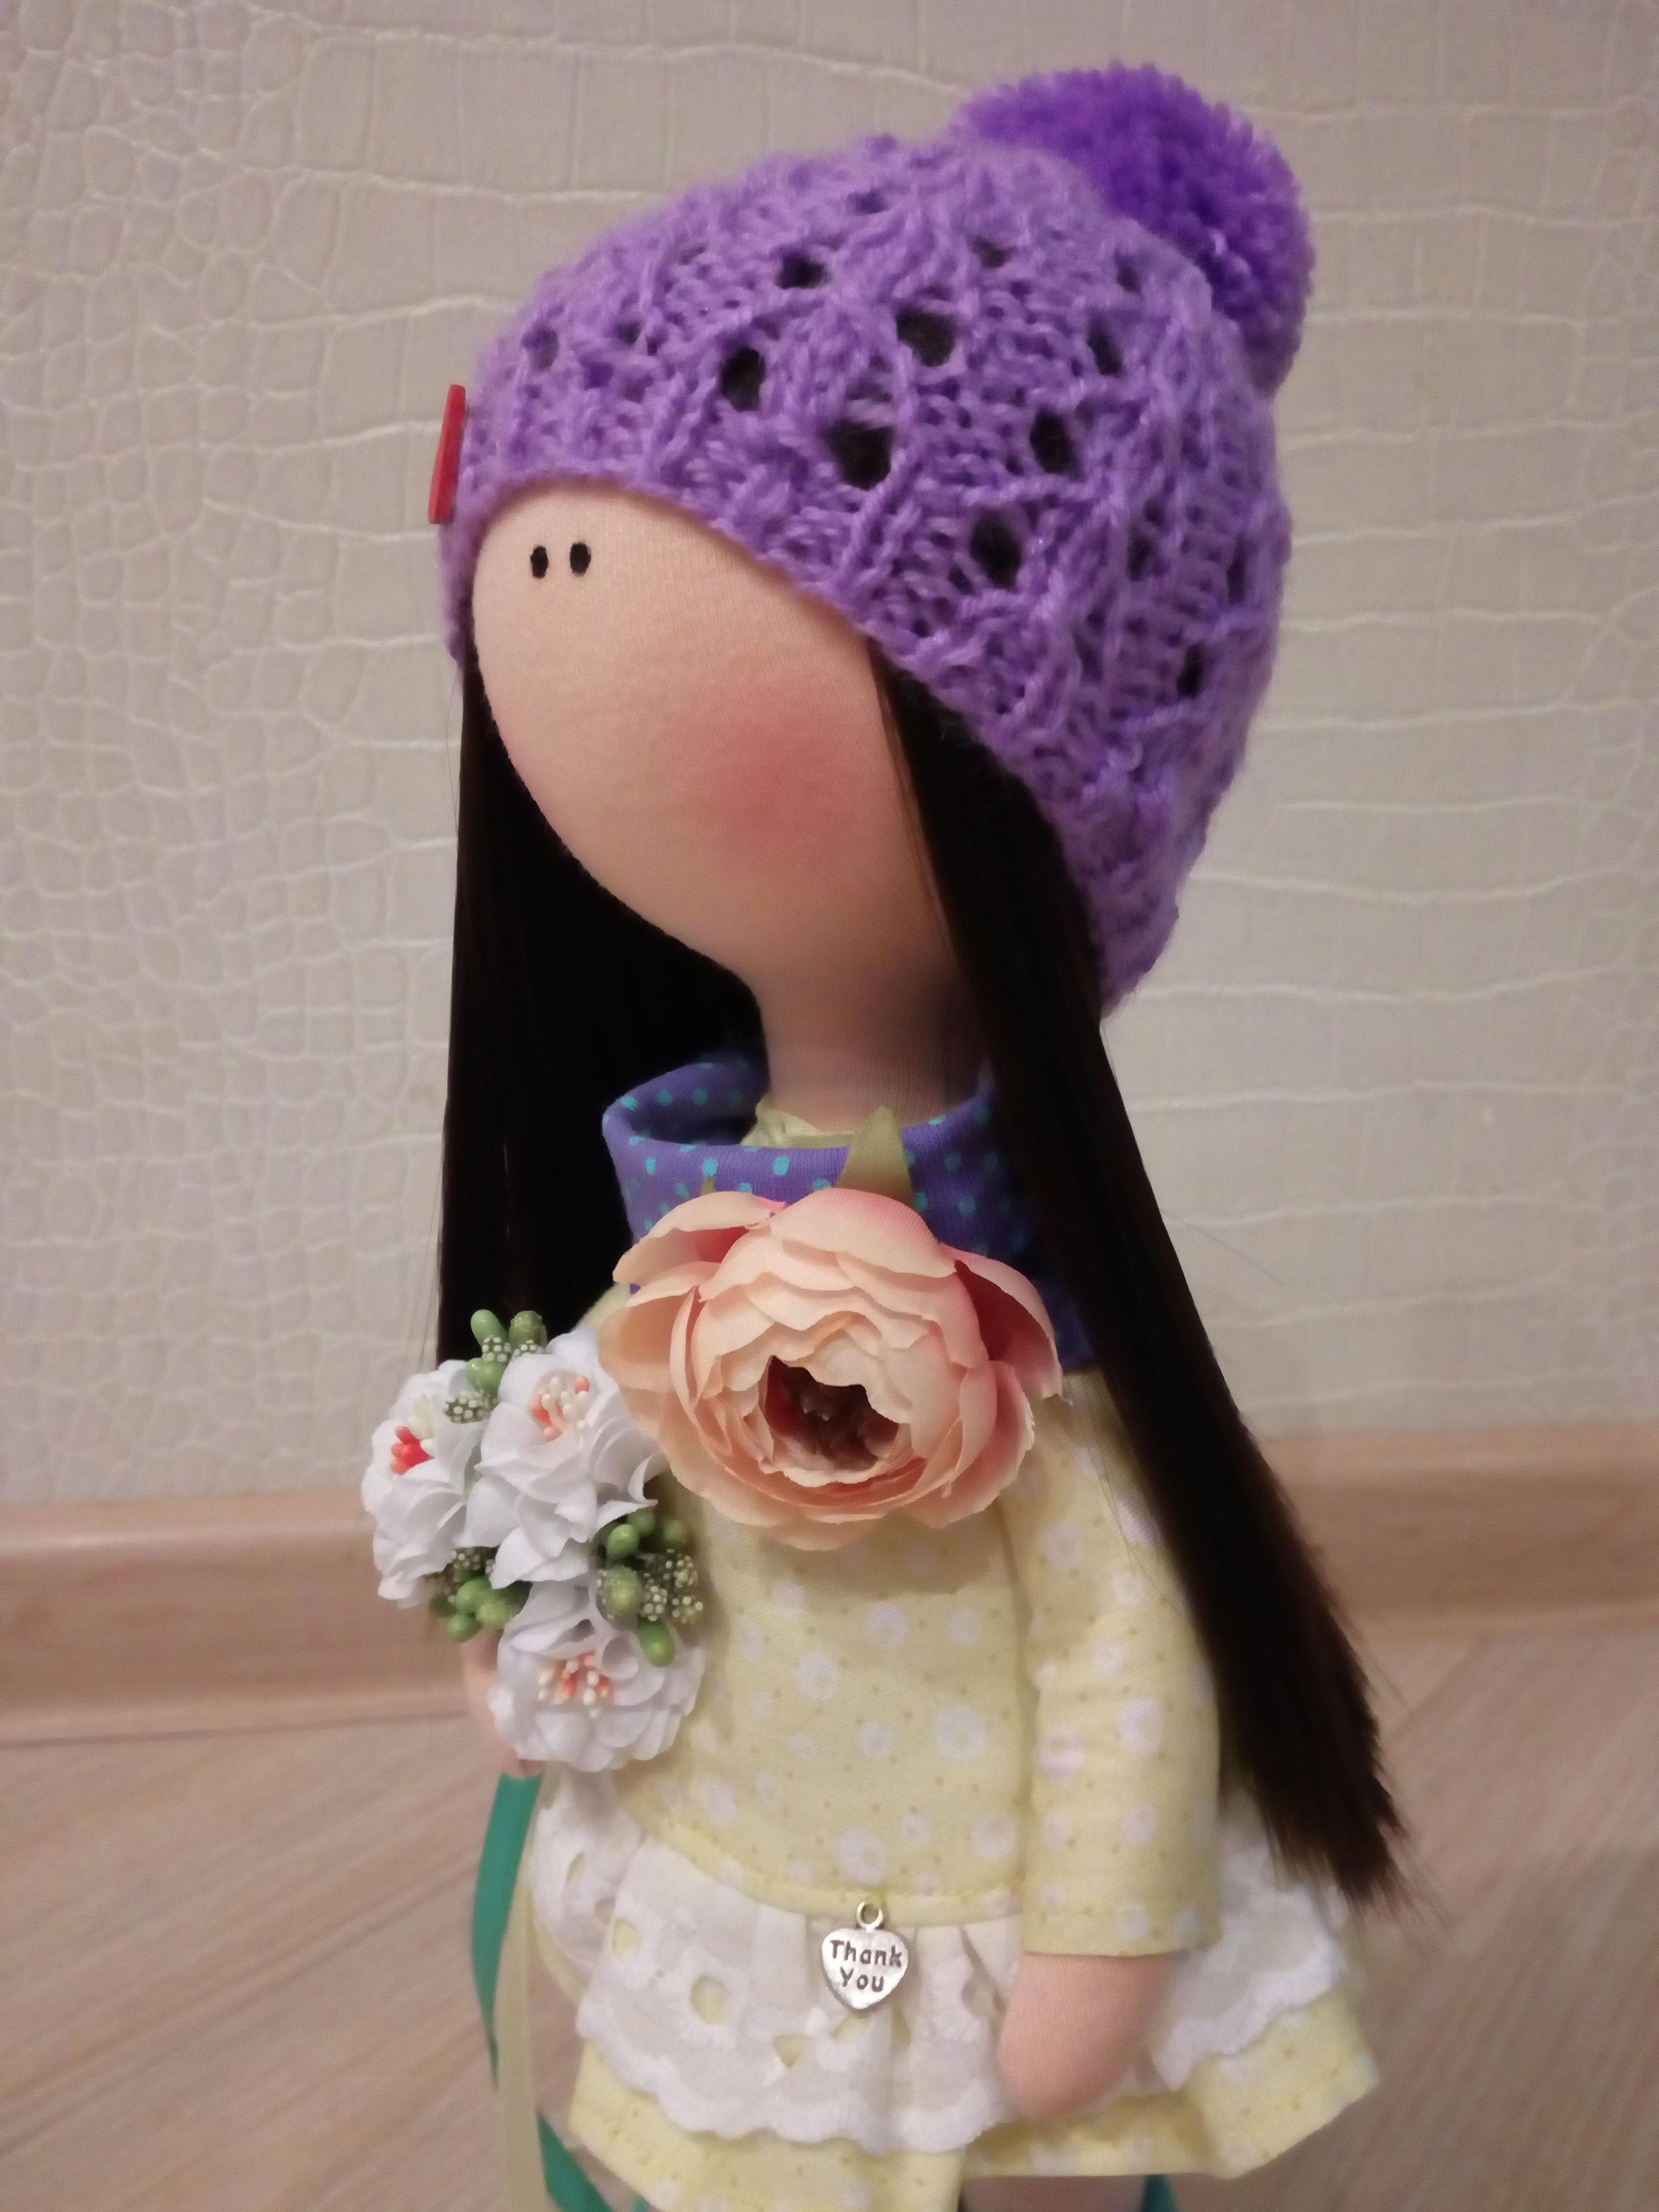 ручнаяработа игрушка кукла тильда куклатильда куклавподарок куклаизткани подарок